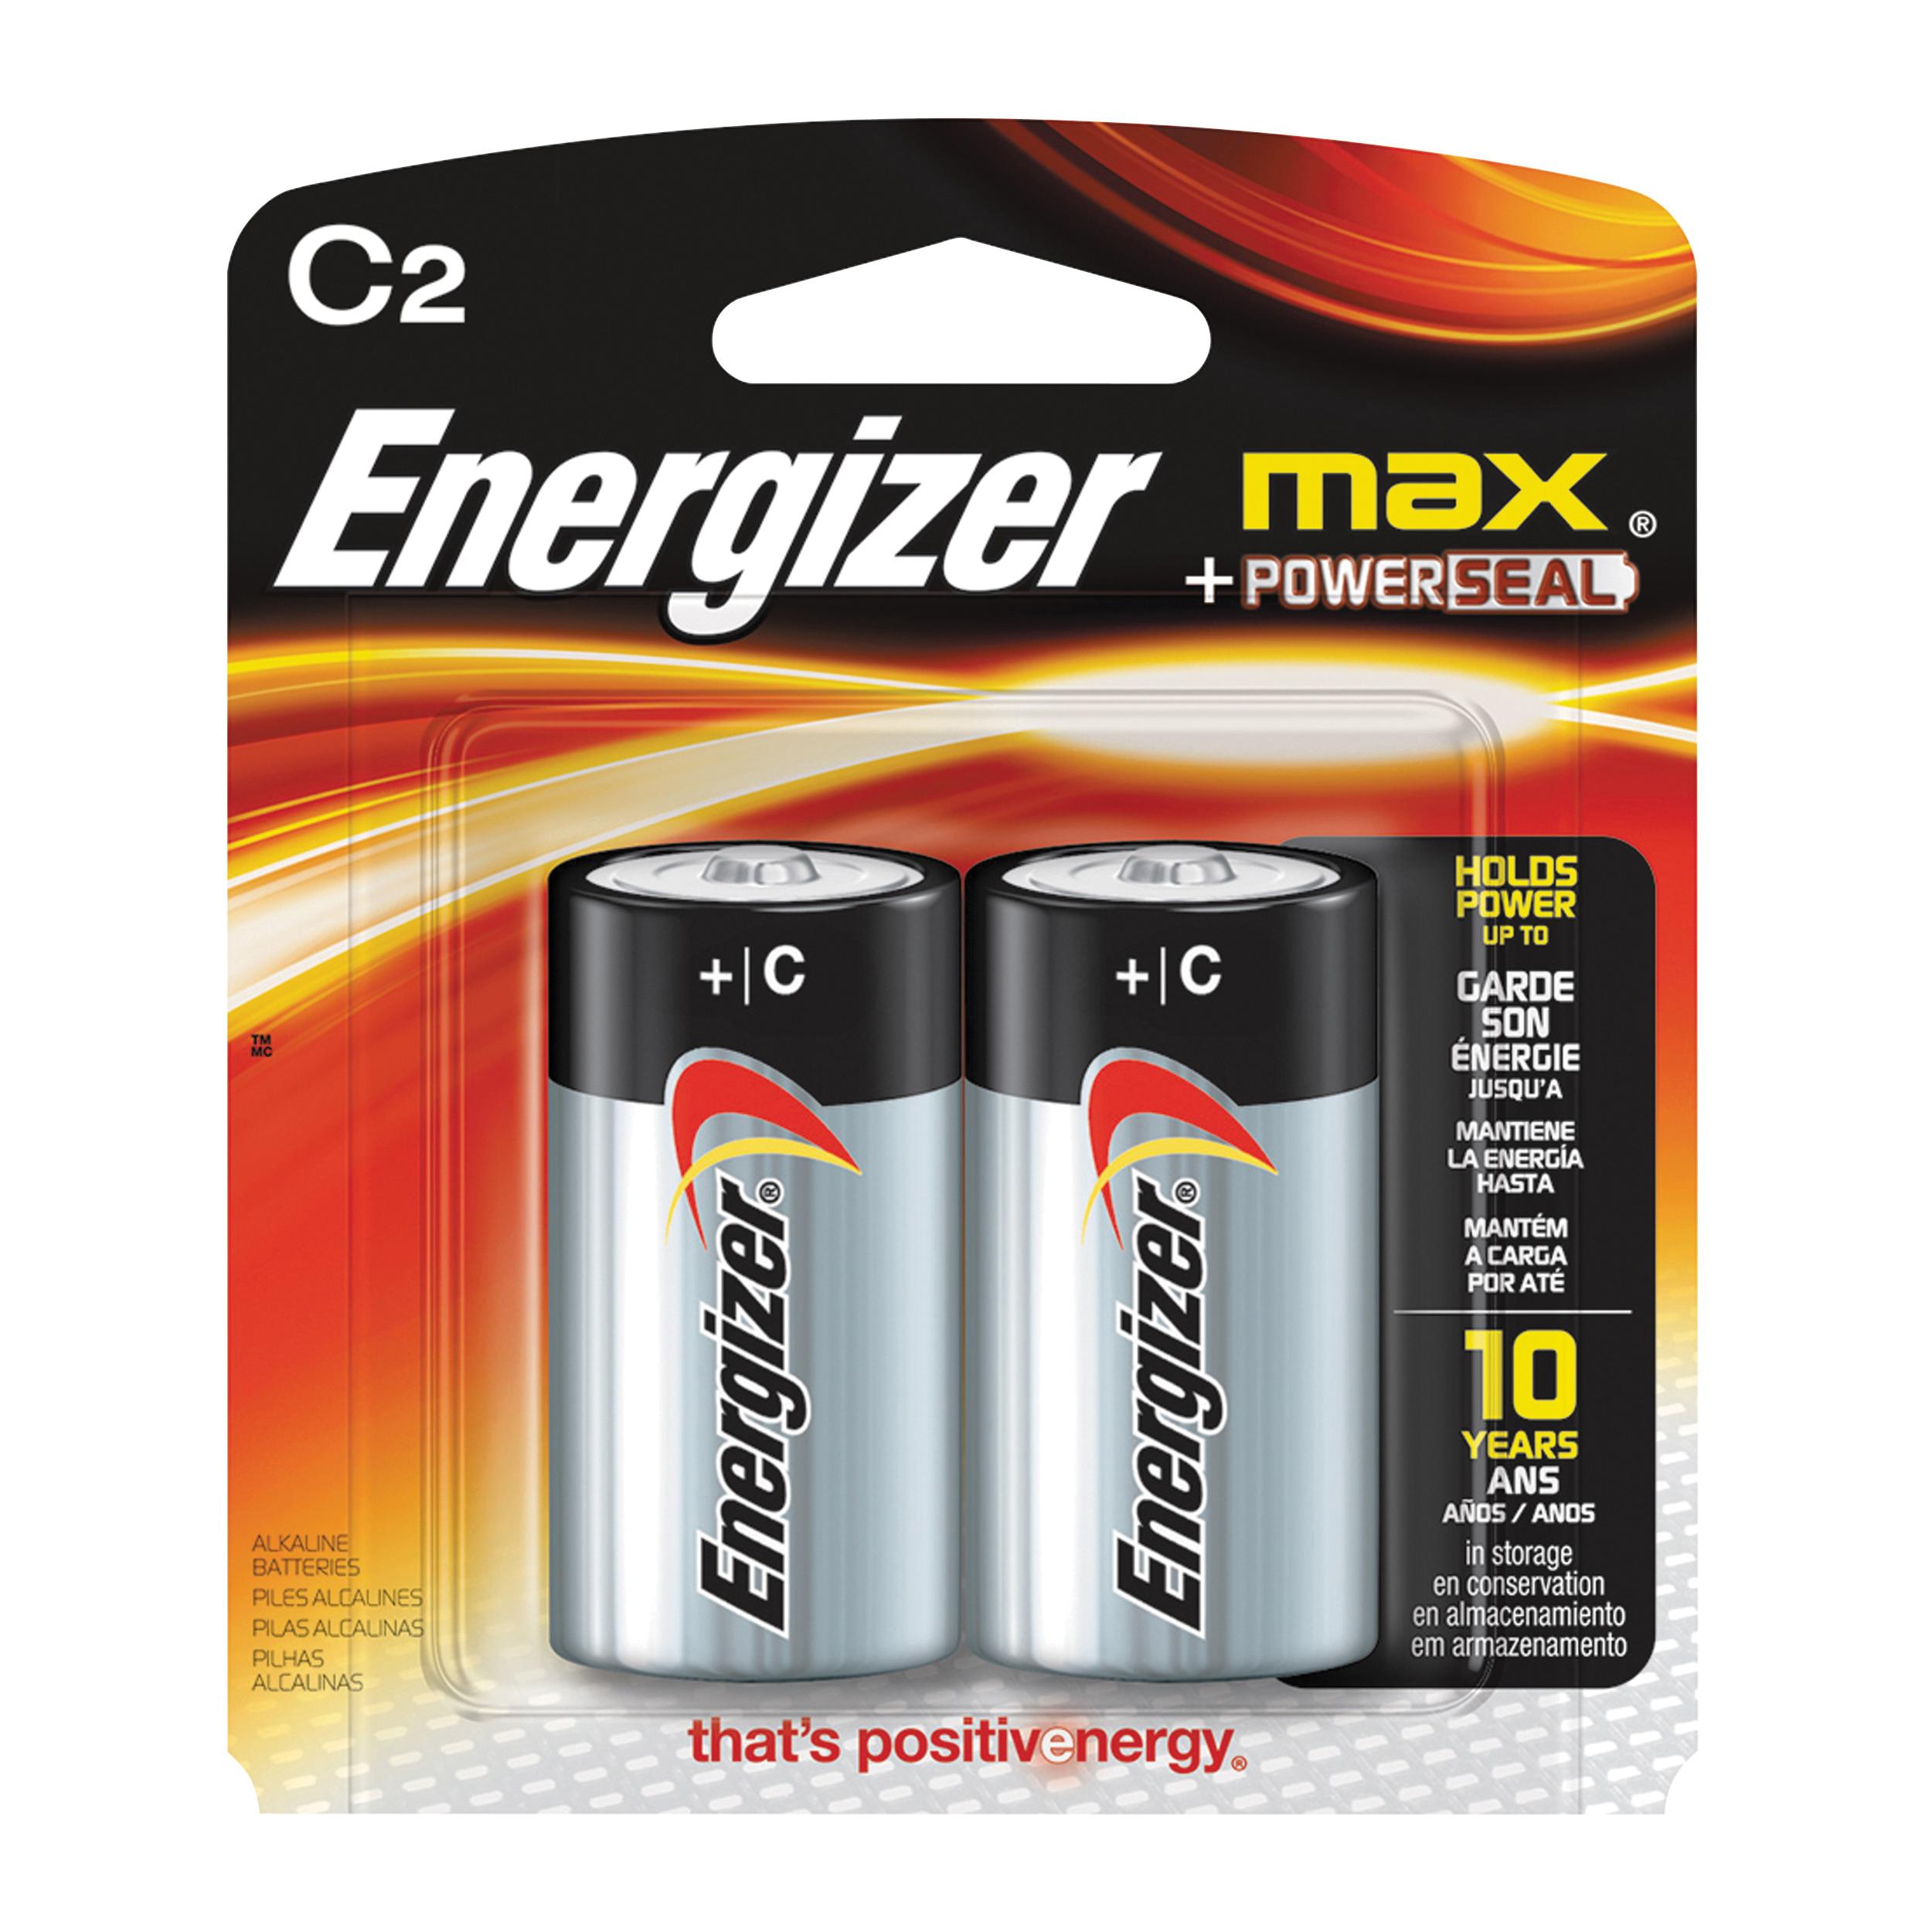 Picture of Energizer E93BP-2 Alkaline Battery, 1.5 V Battery, C Battery, Zinc, Manganese Dioxide